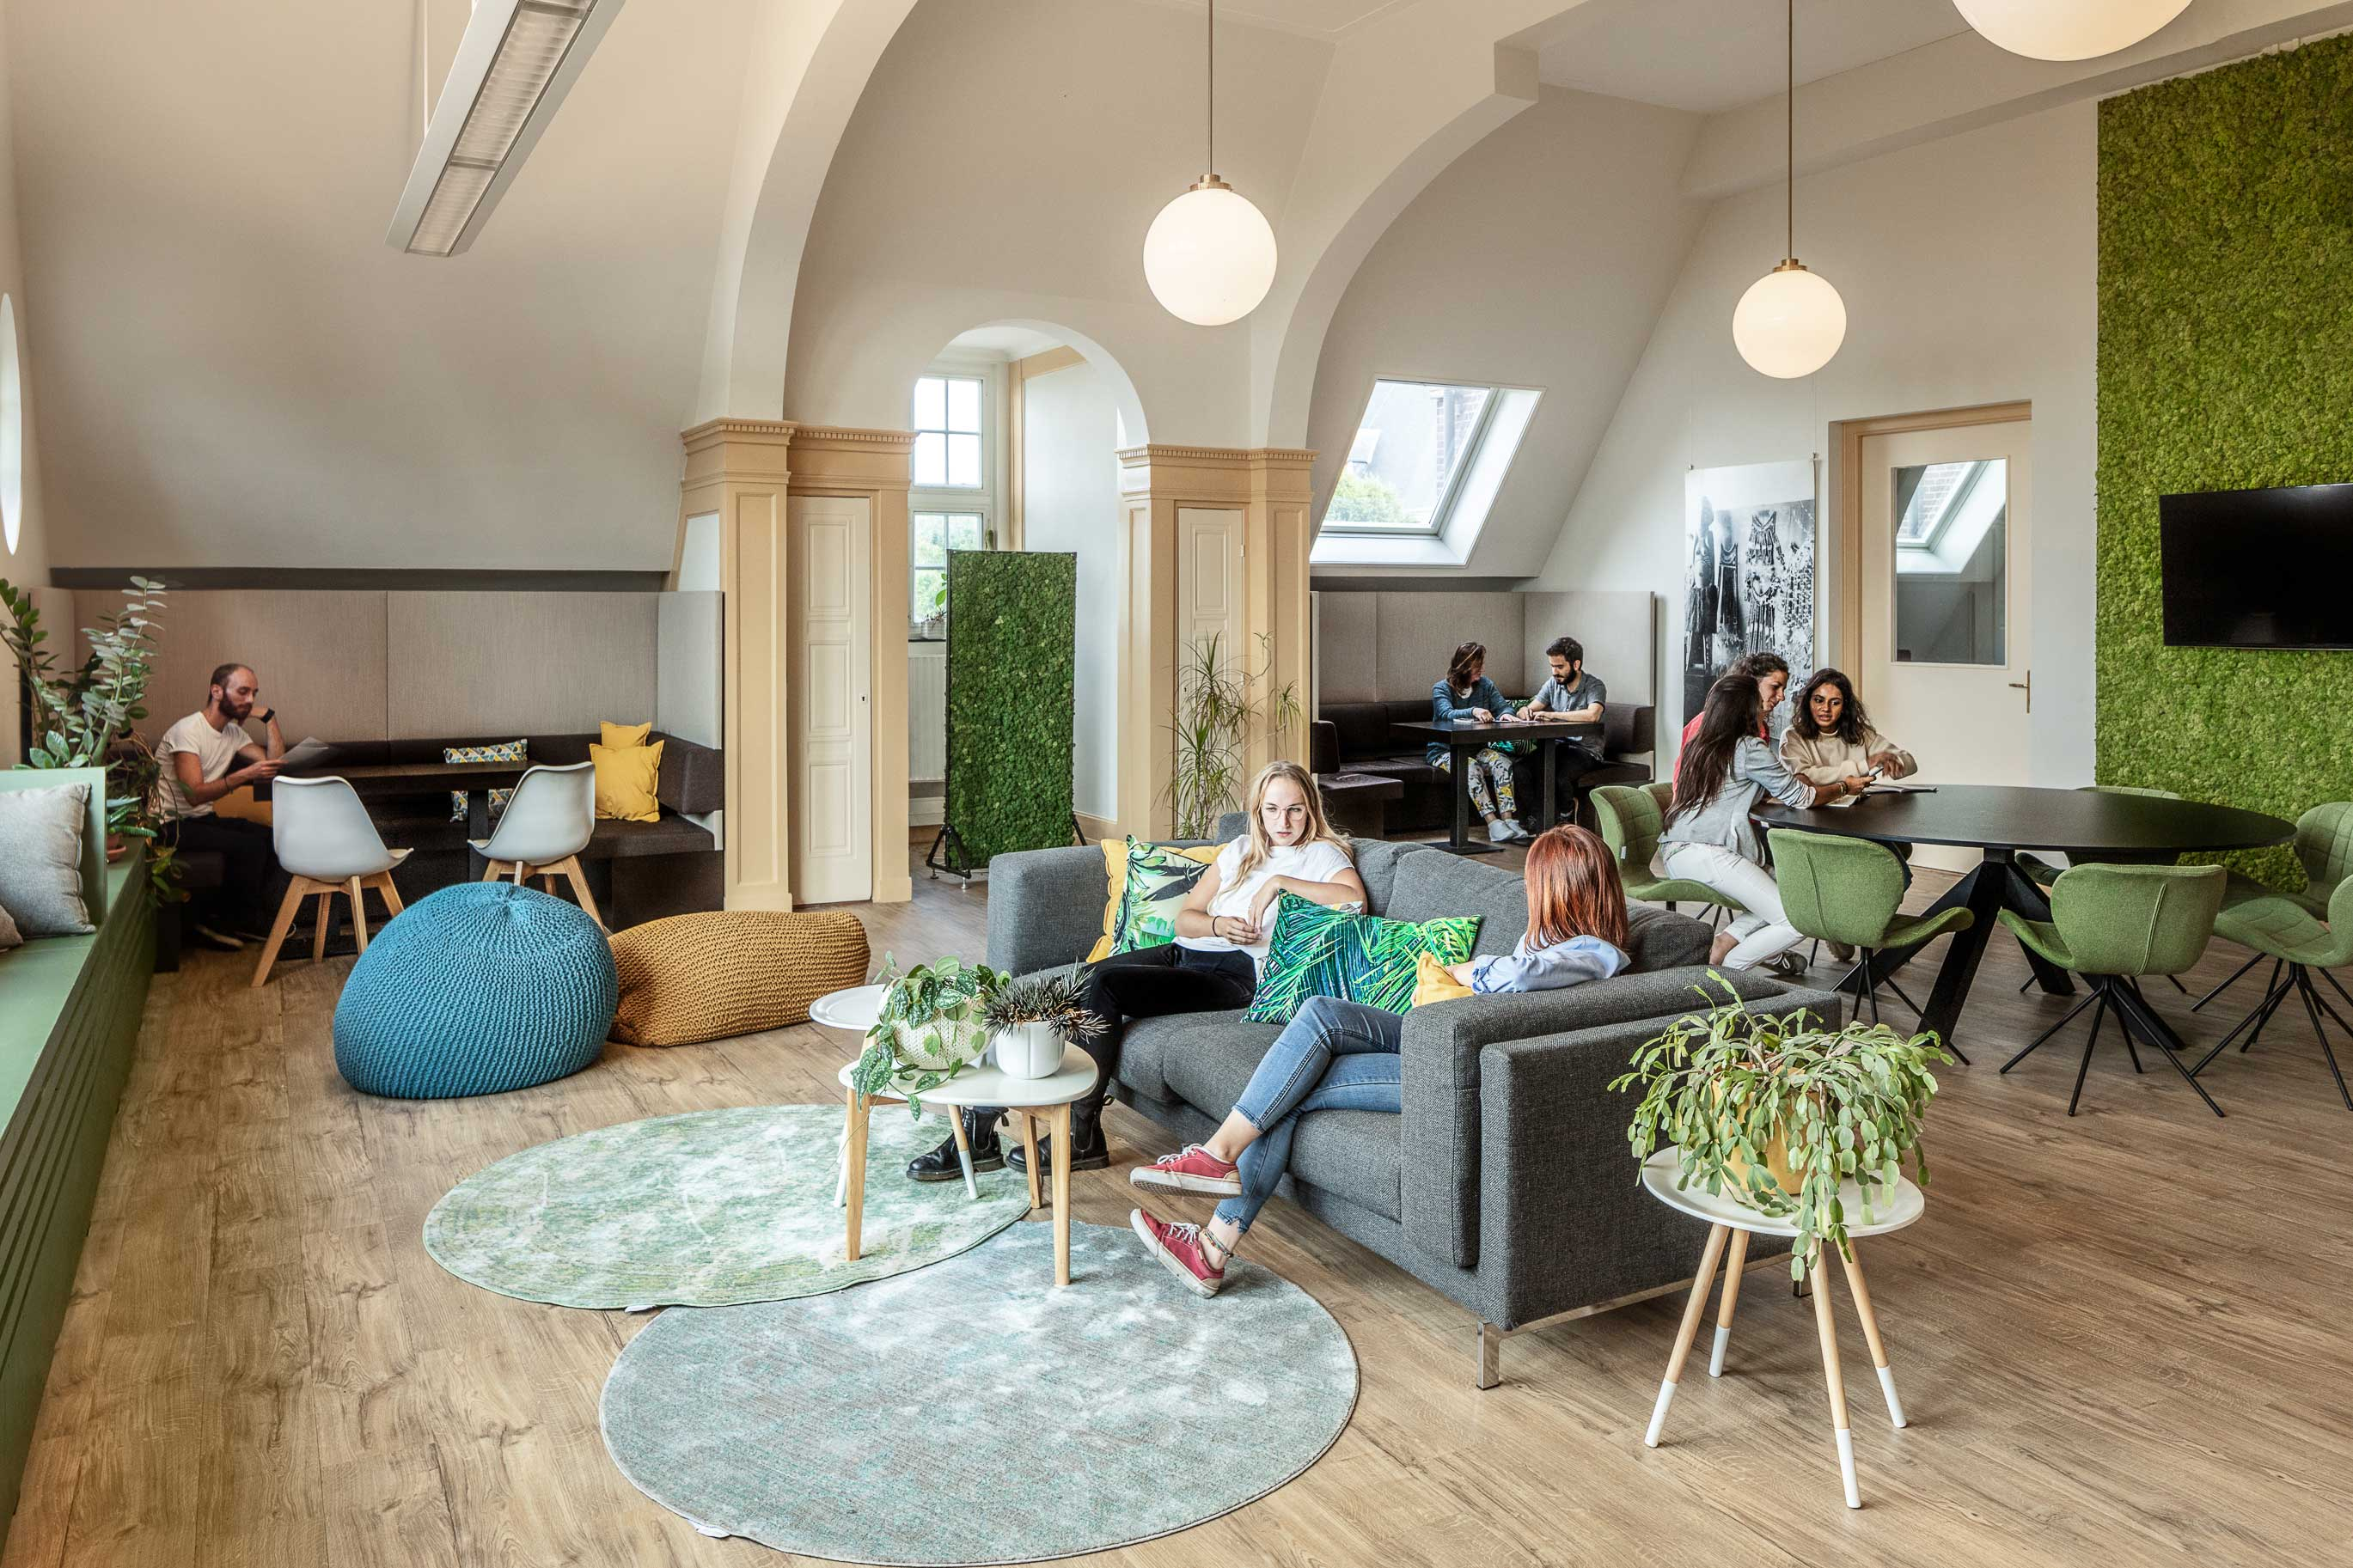 Workplace designed by Akka Architects